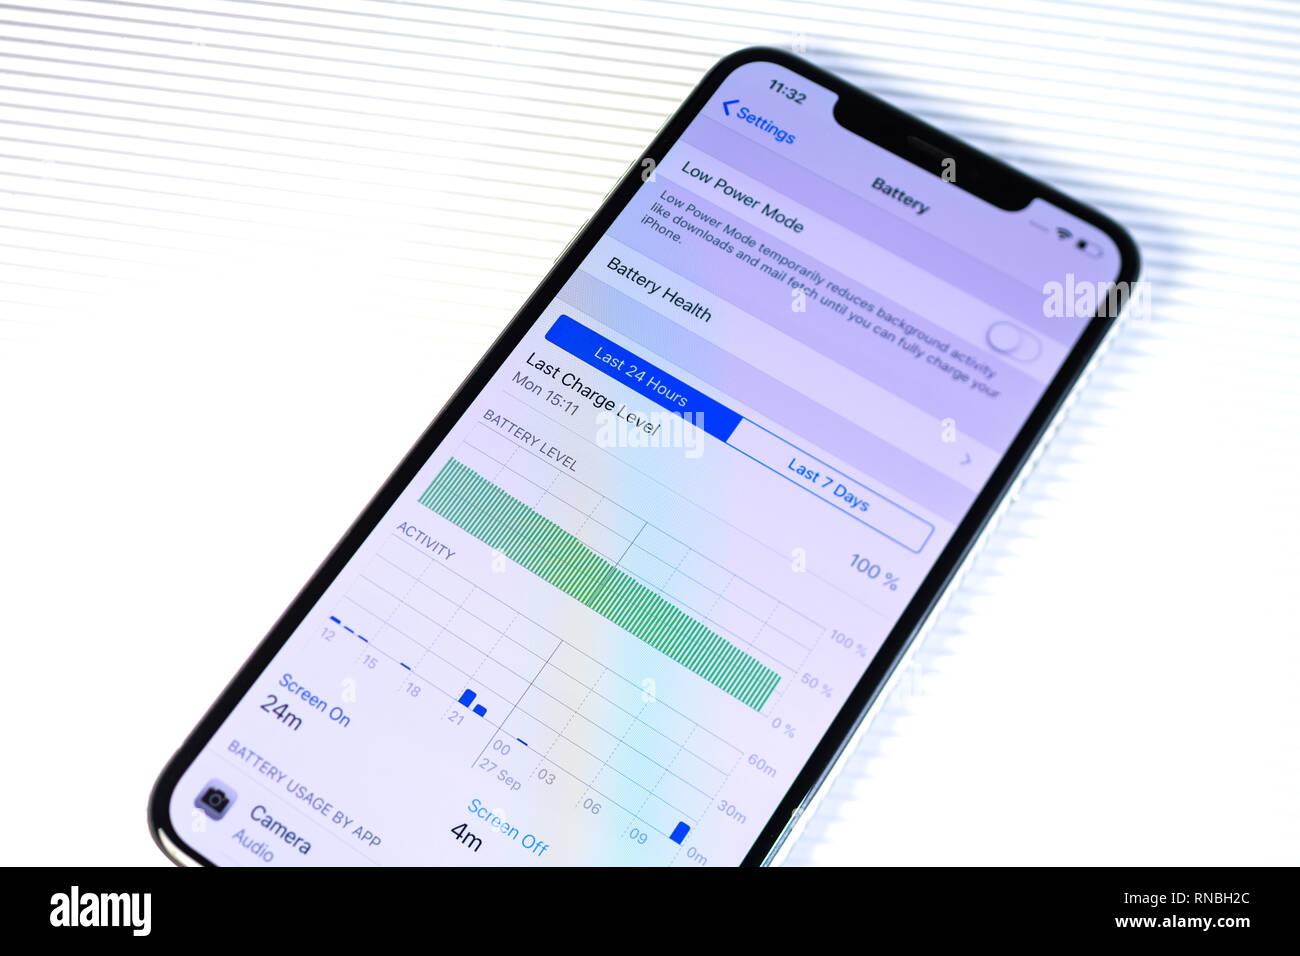 PARIS, FRANCE - SEP 27, 2018: new iPhone Xs Max smartphone